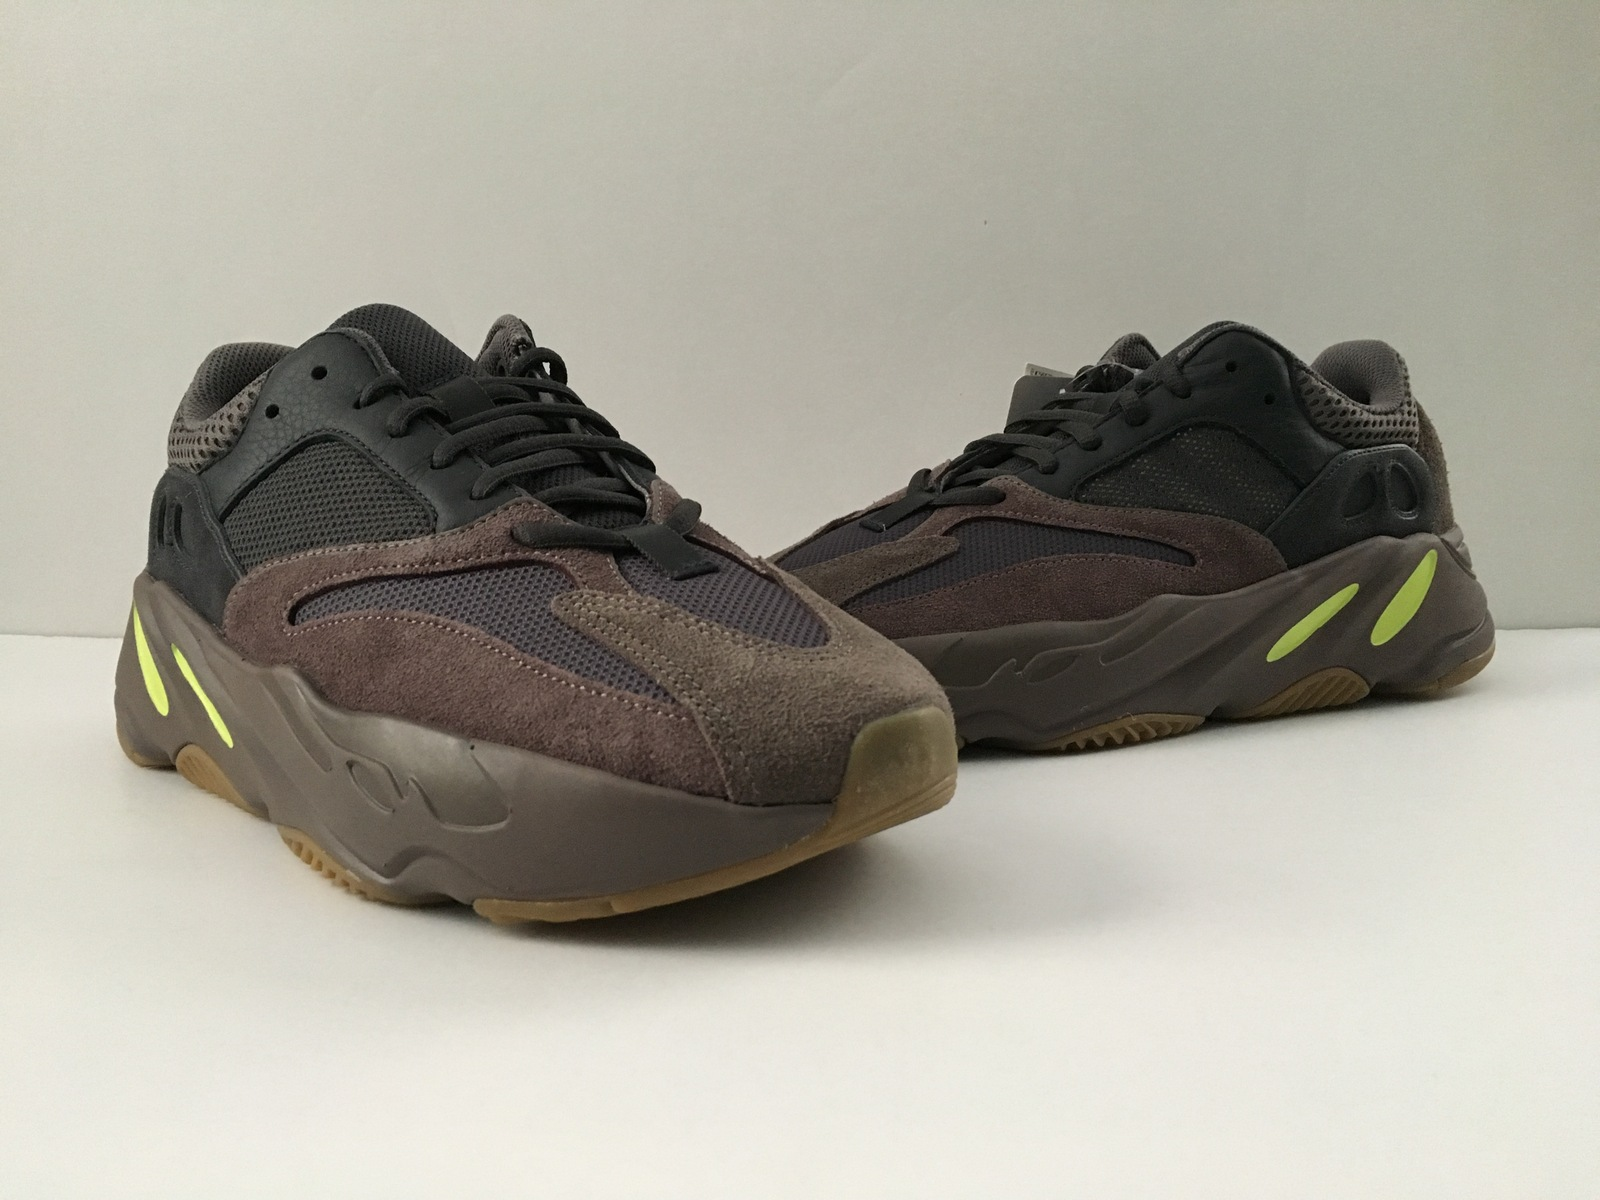 d677a8eba643f adidas Yeezy 700 Mauve EE9614 Men s Size 9 and 50 similar items. Img 7667